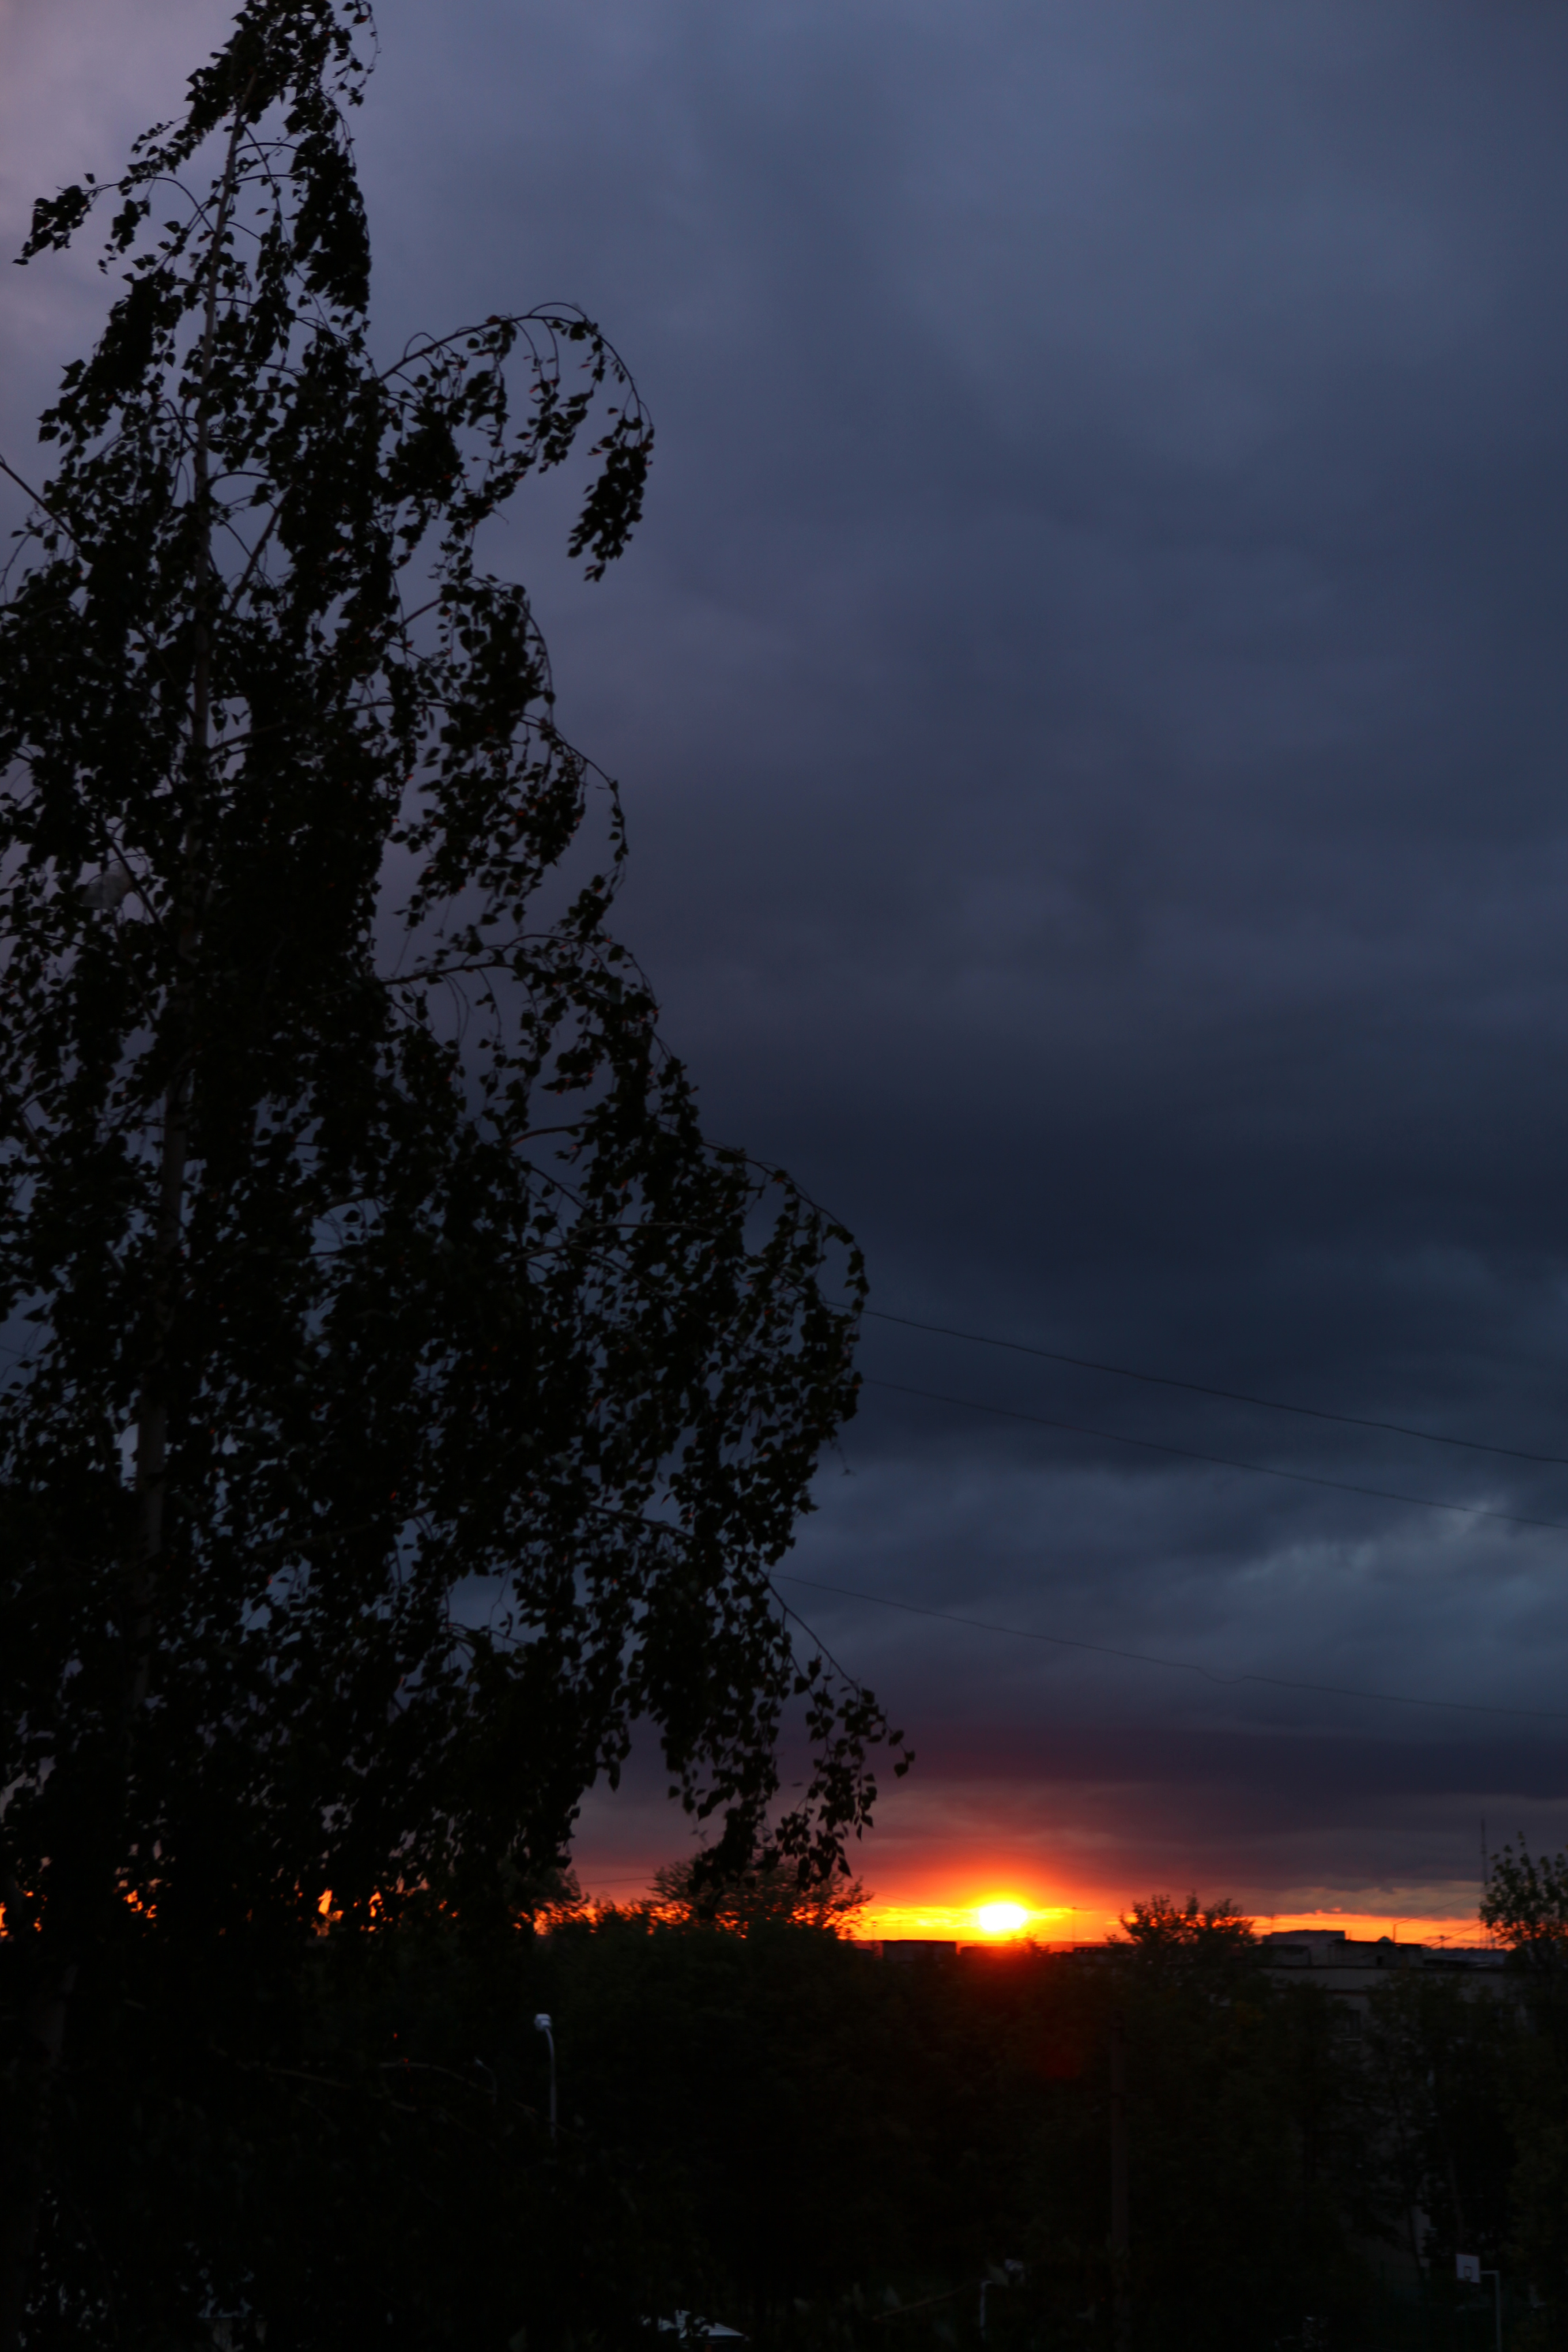 Sunset sky., Yellow, Remote, View, Sunset, HQ Photo